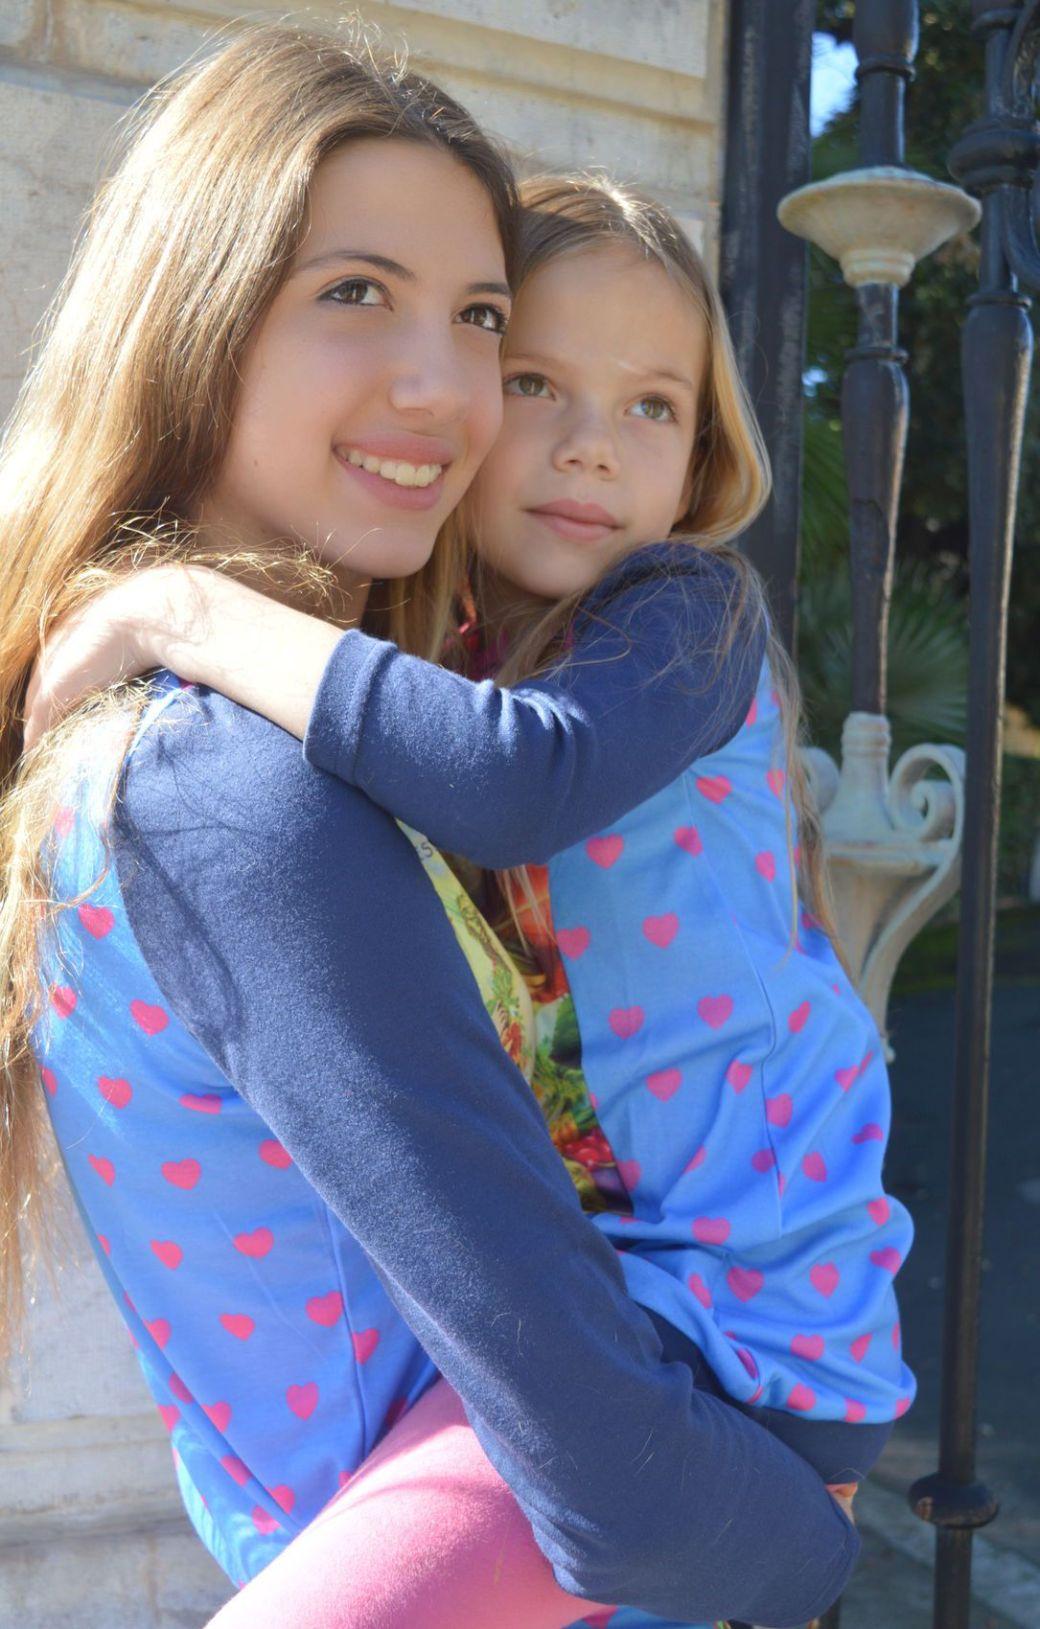 rosalita señoritas moda infantil y juvenil 2